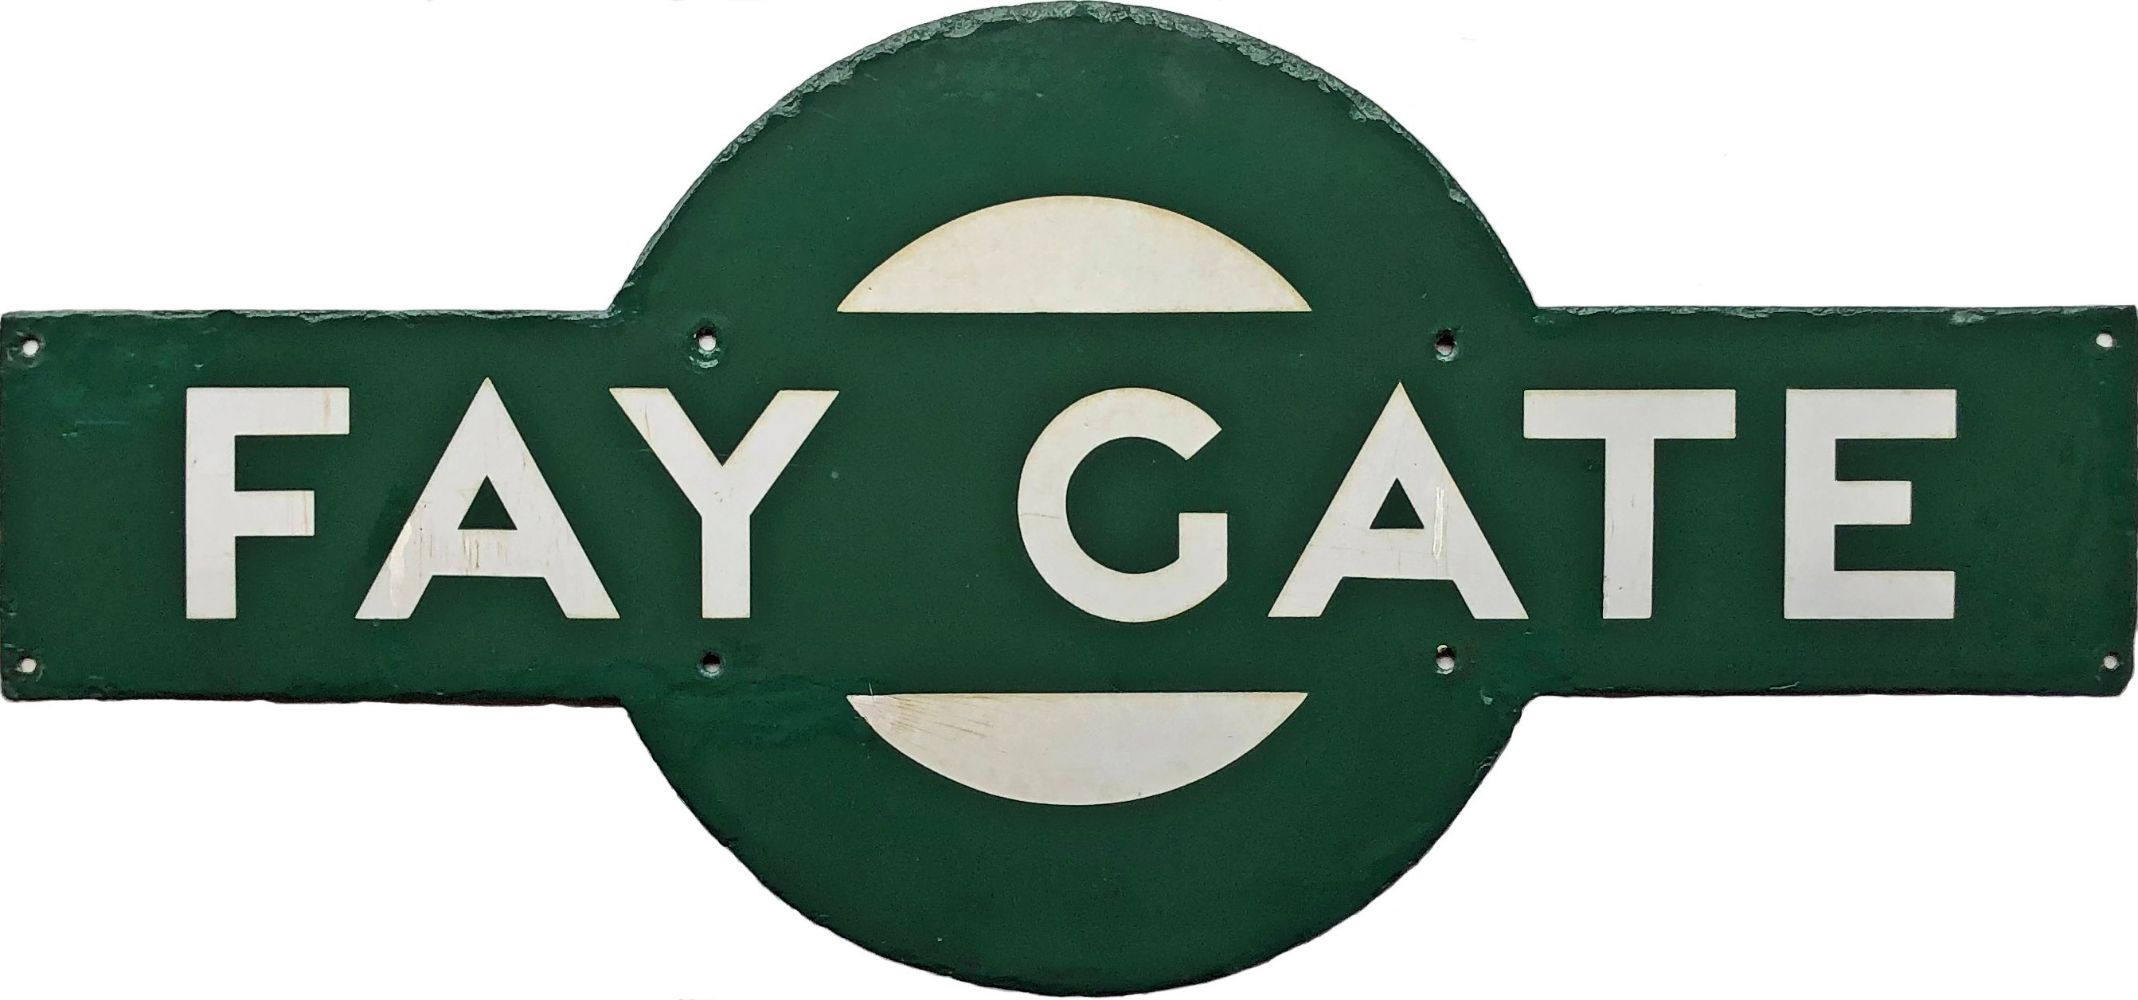 A sale of Underground, Railwayana, Bus, Tram & Trolleybus Collectables